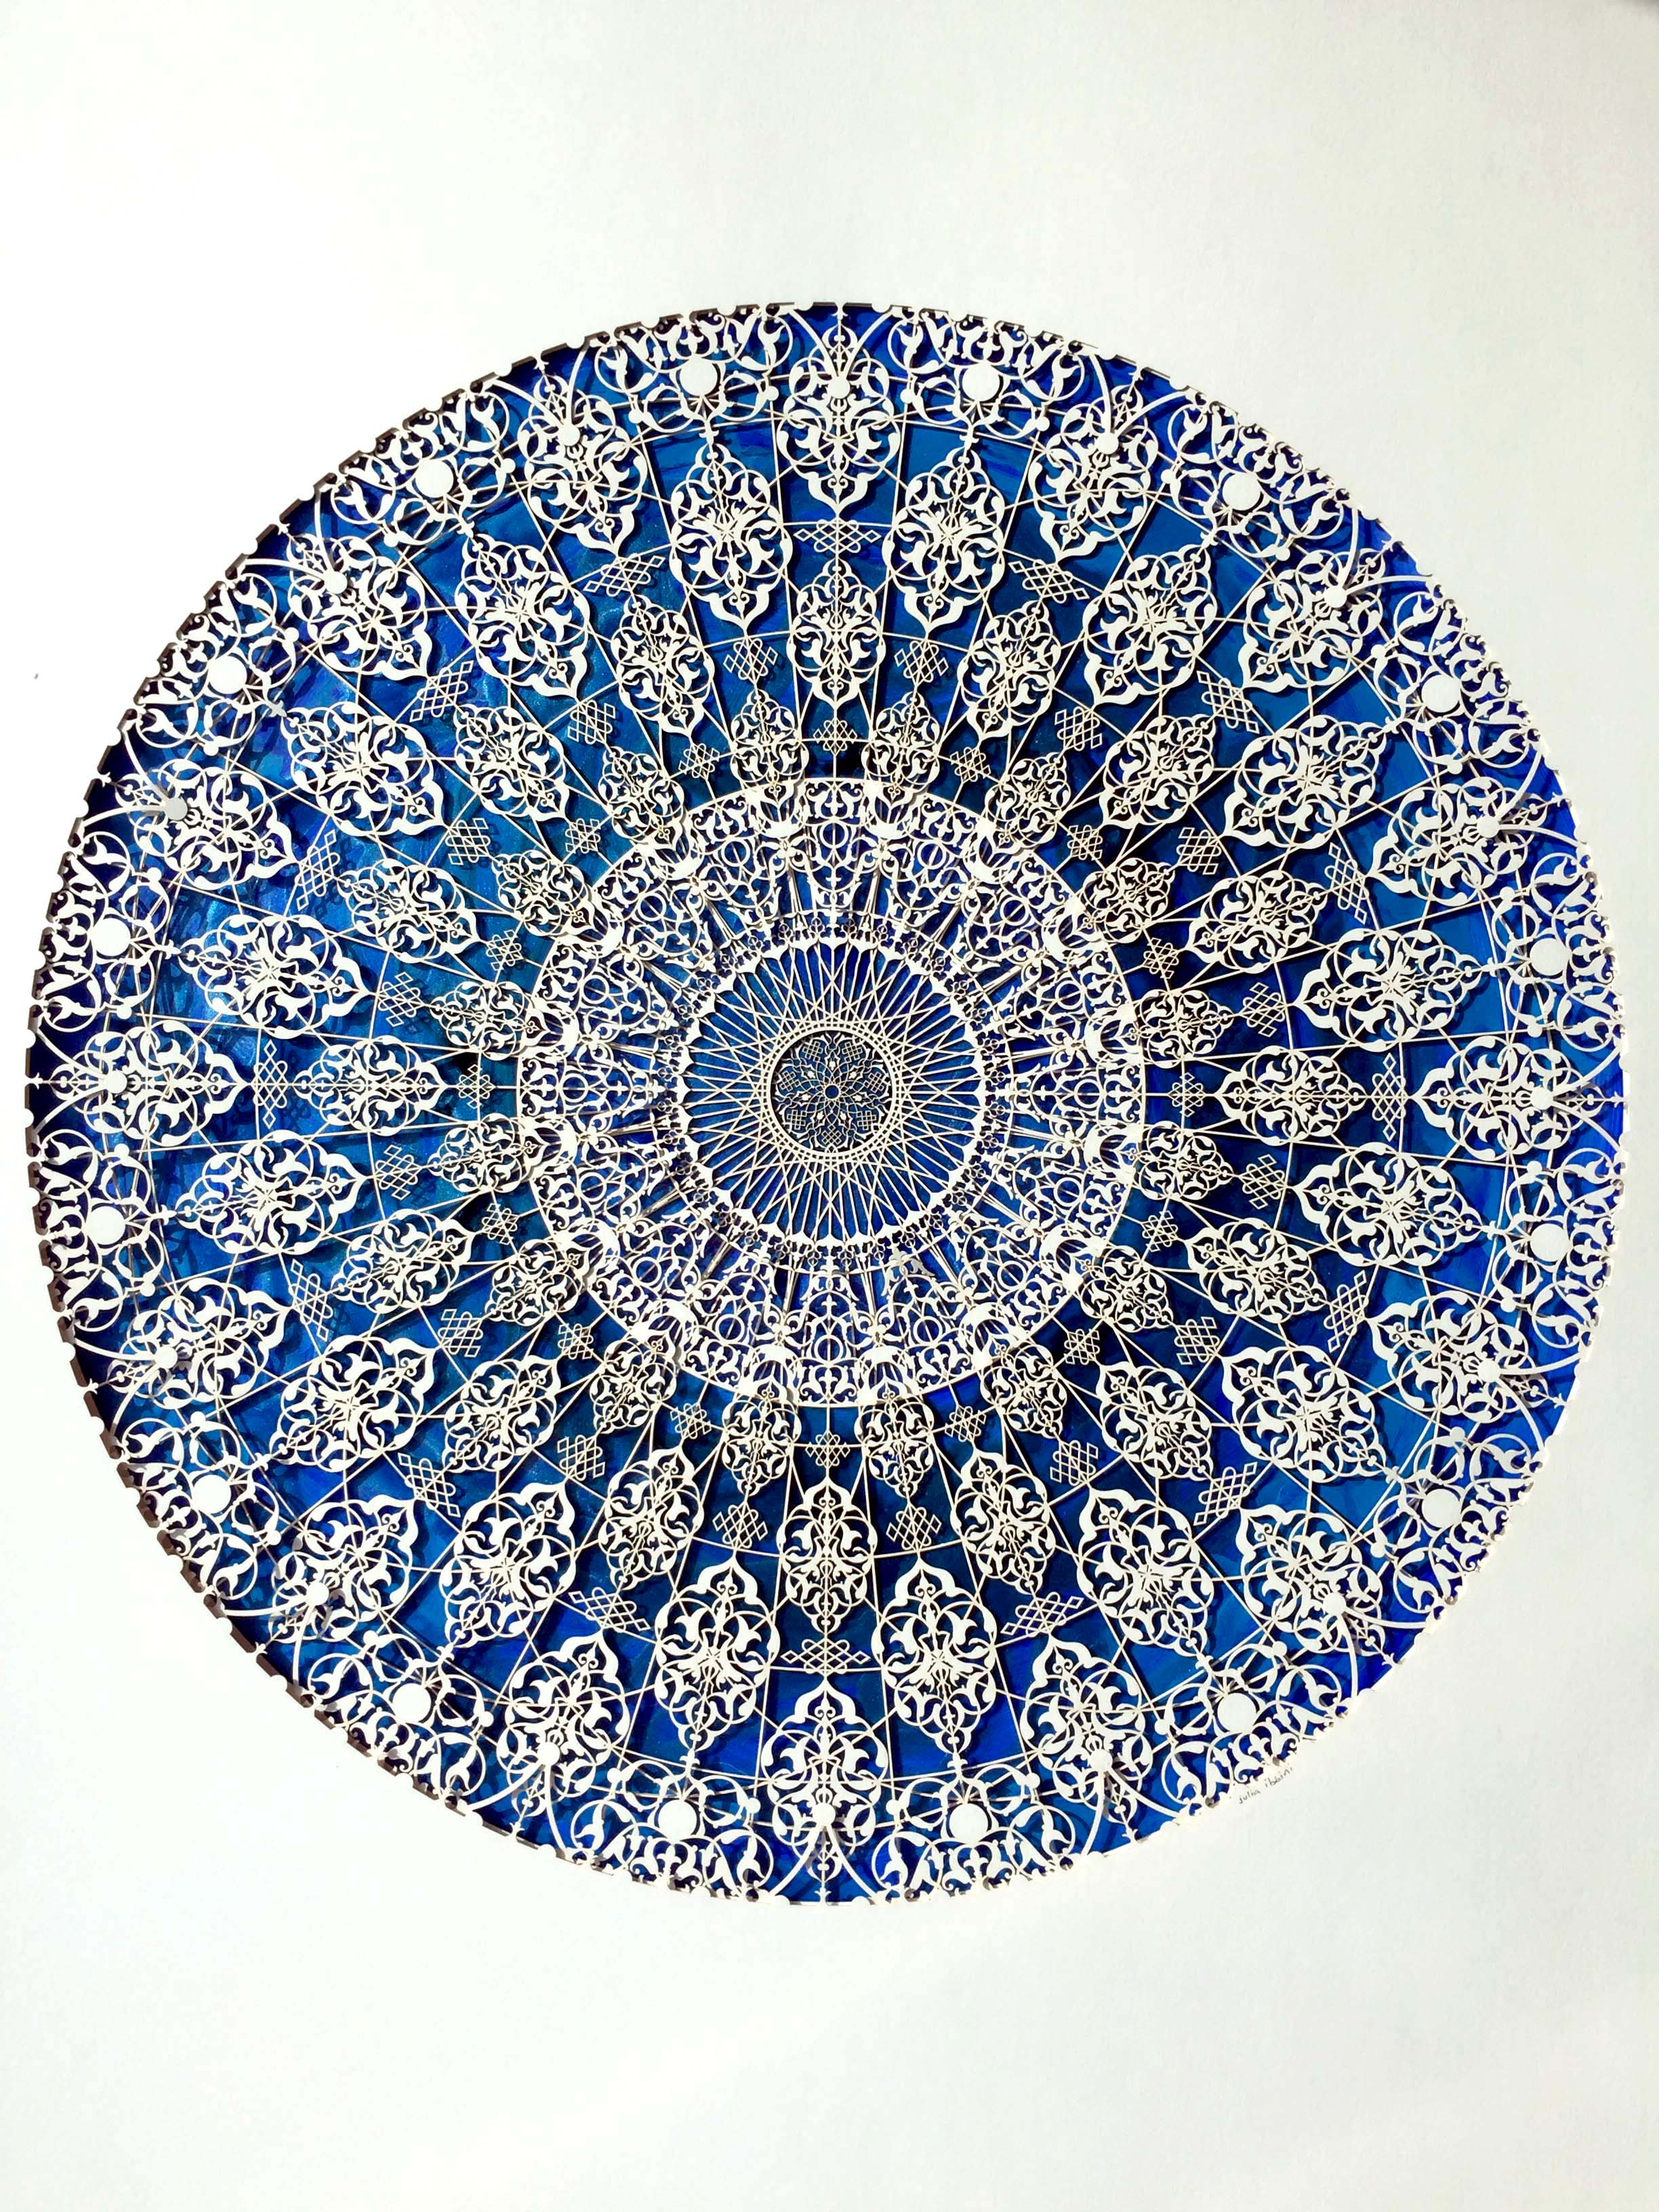 Julia Ibbini - Untitled Study (The Compass) 45cm x 60cm.jpg